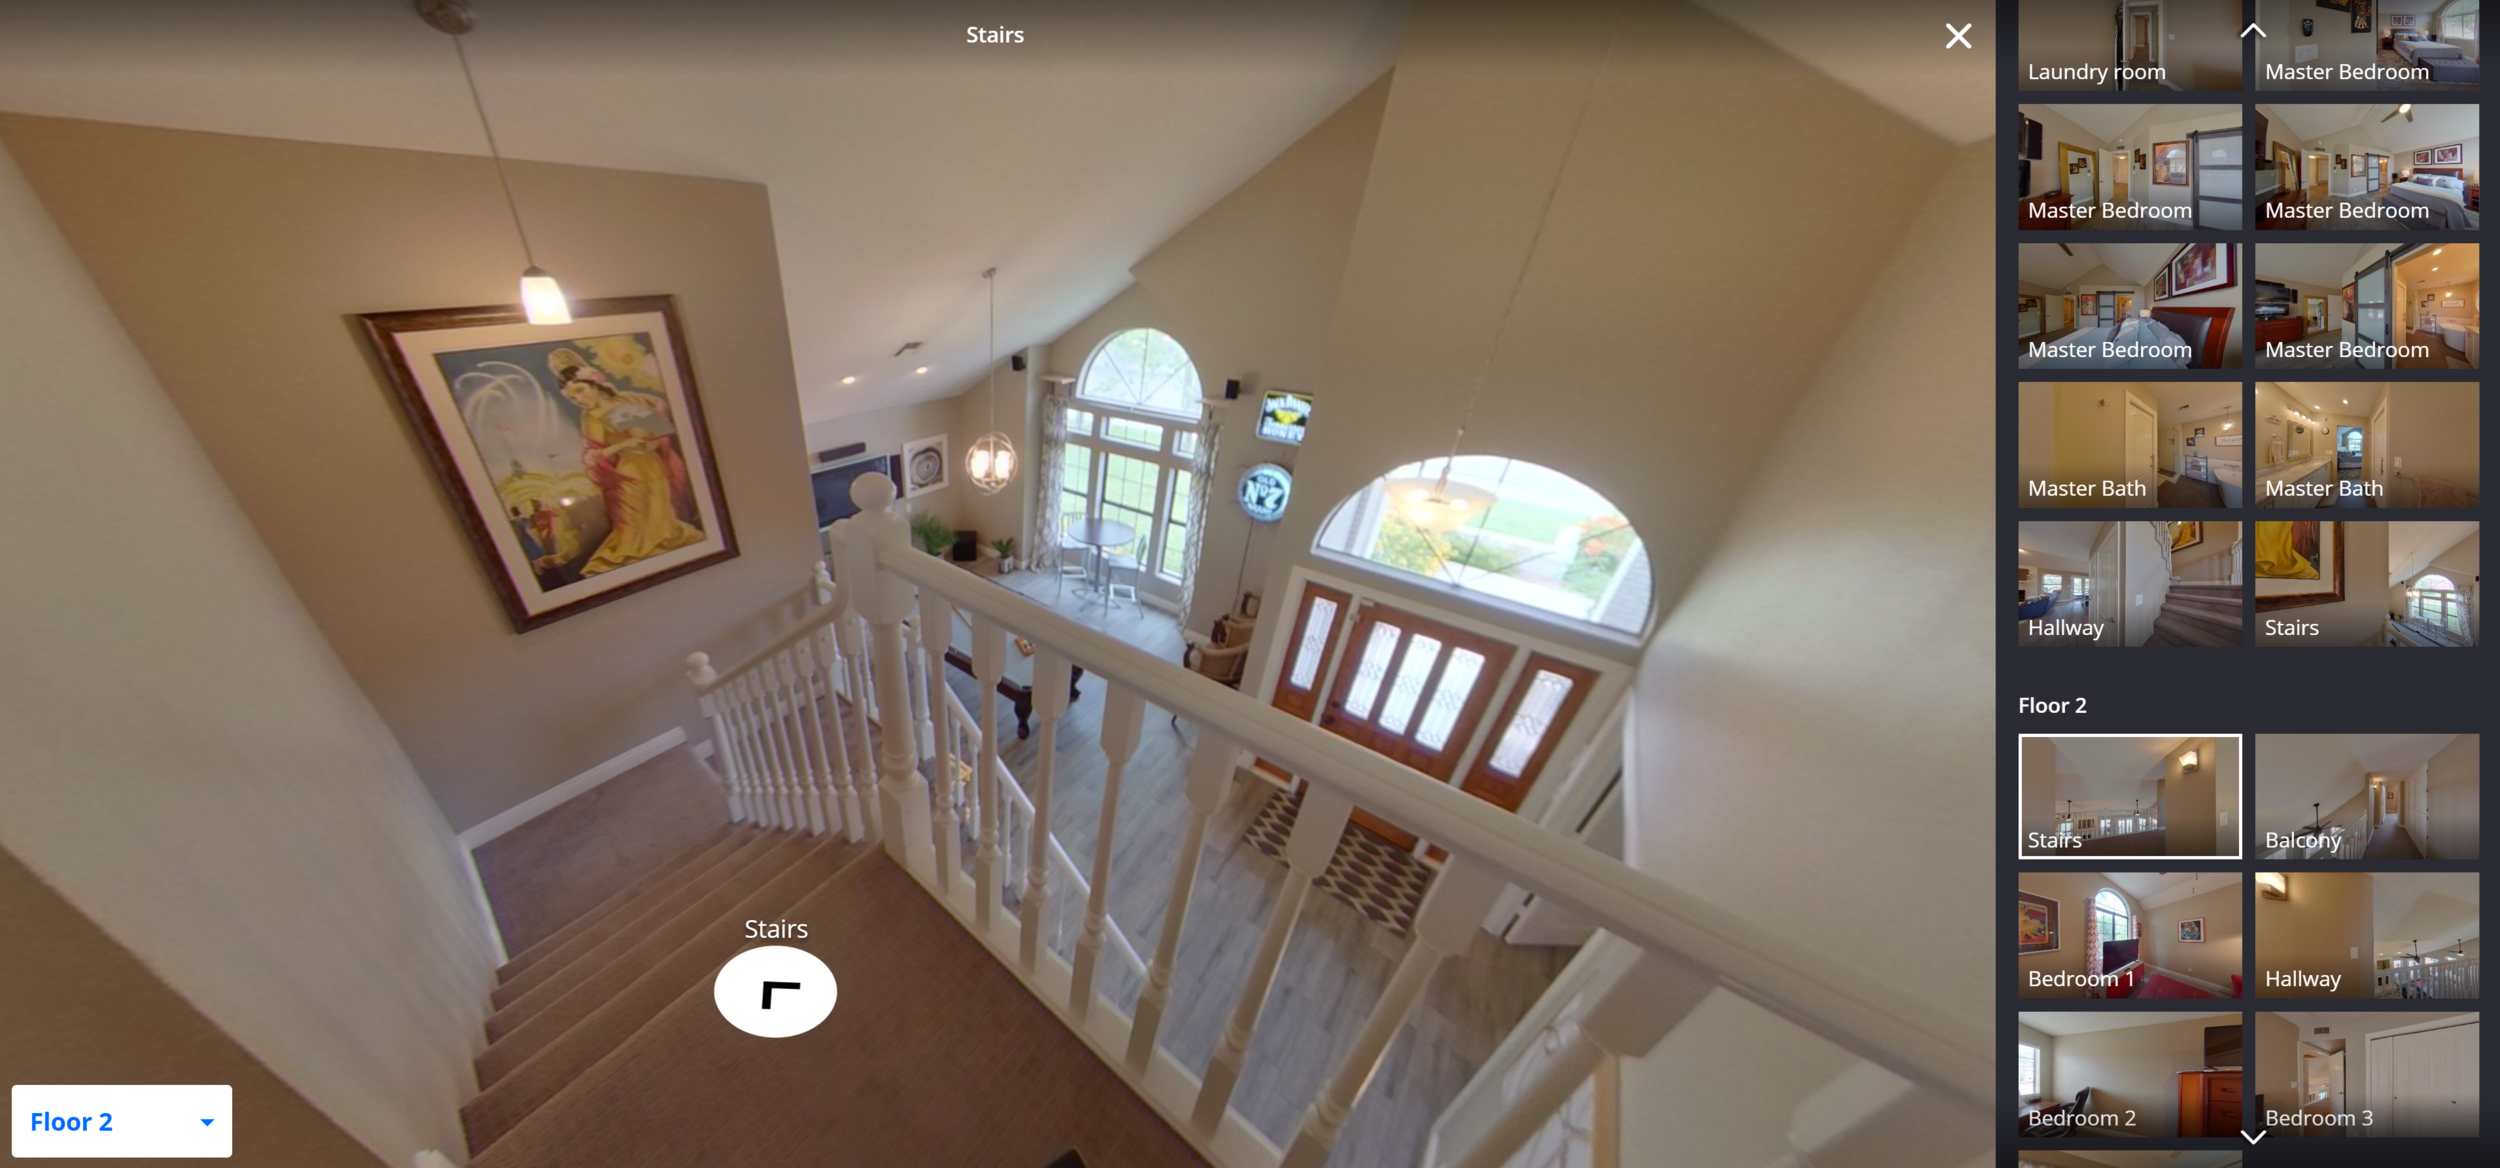 Click the image to take a 360 Virtual Tour!